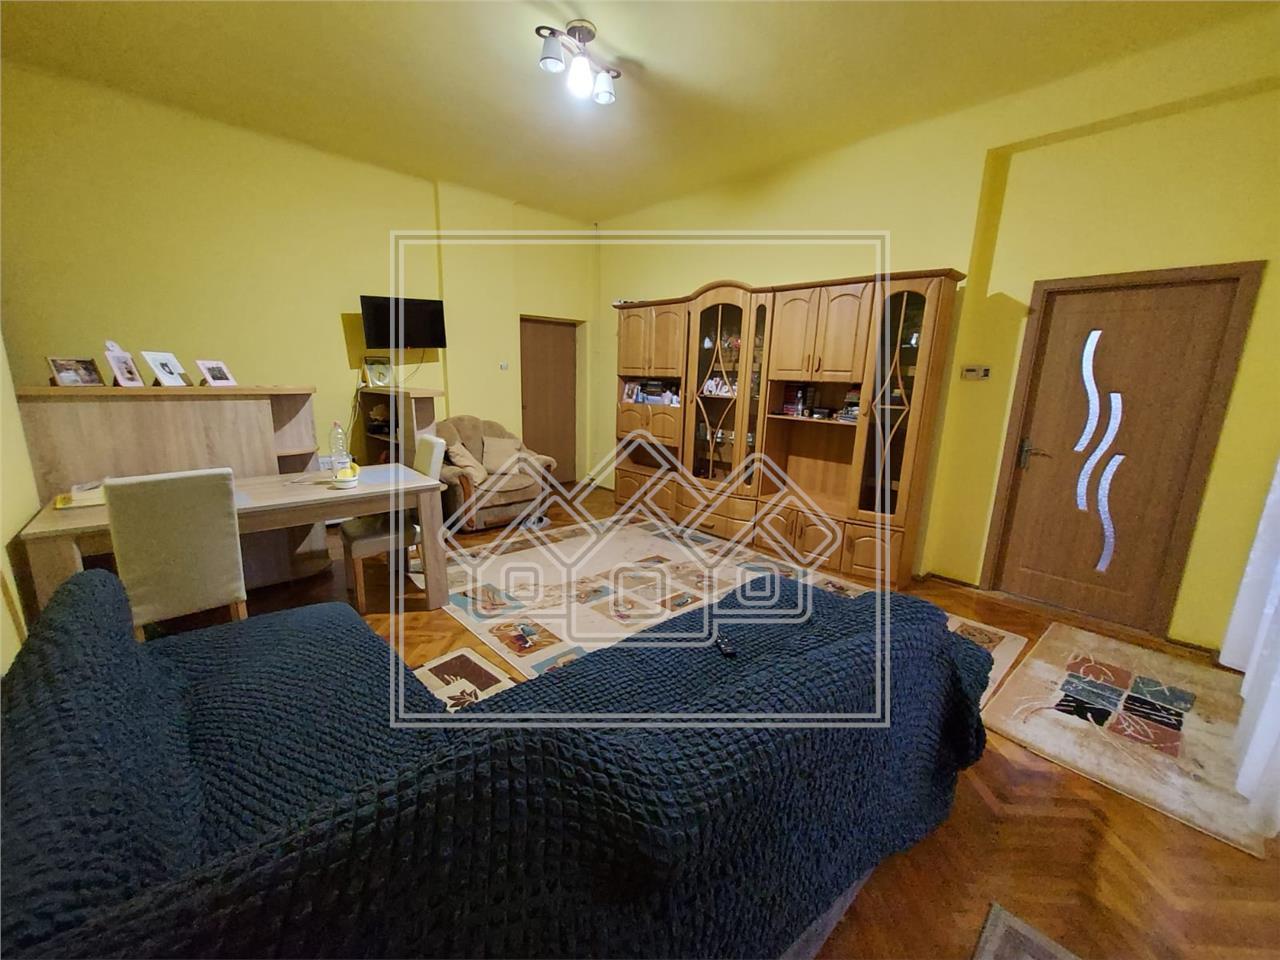 Casa de vanzare in Sibiu zona Trei Stejari teren 537mp